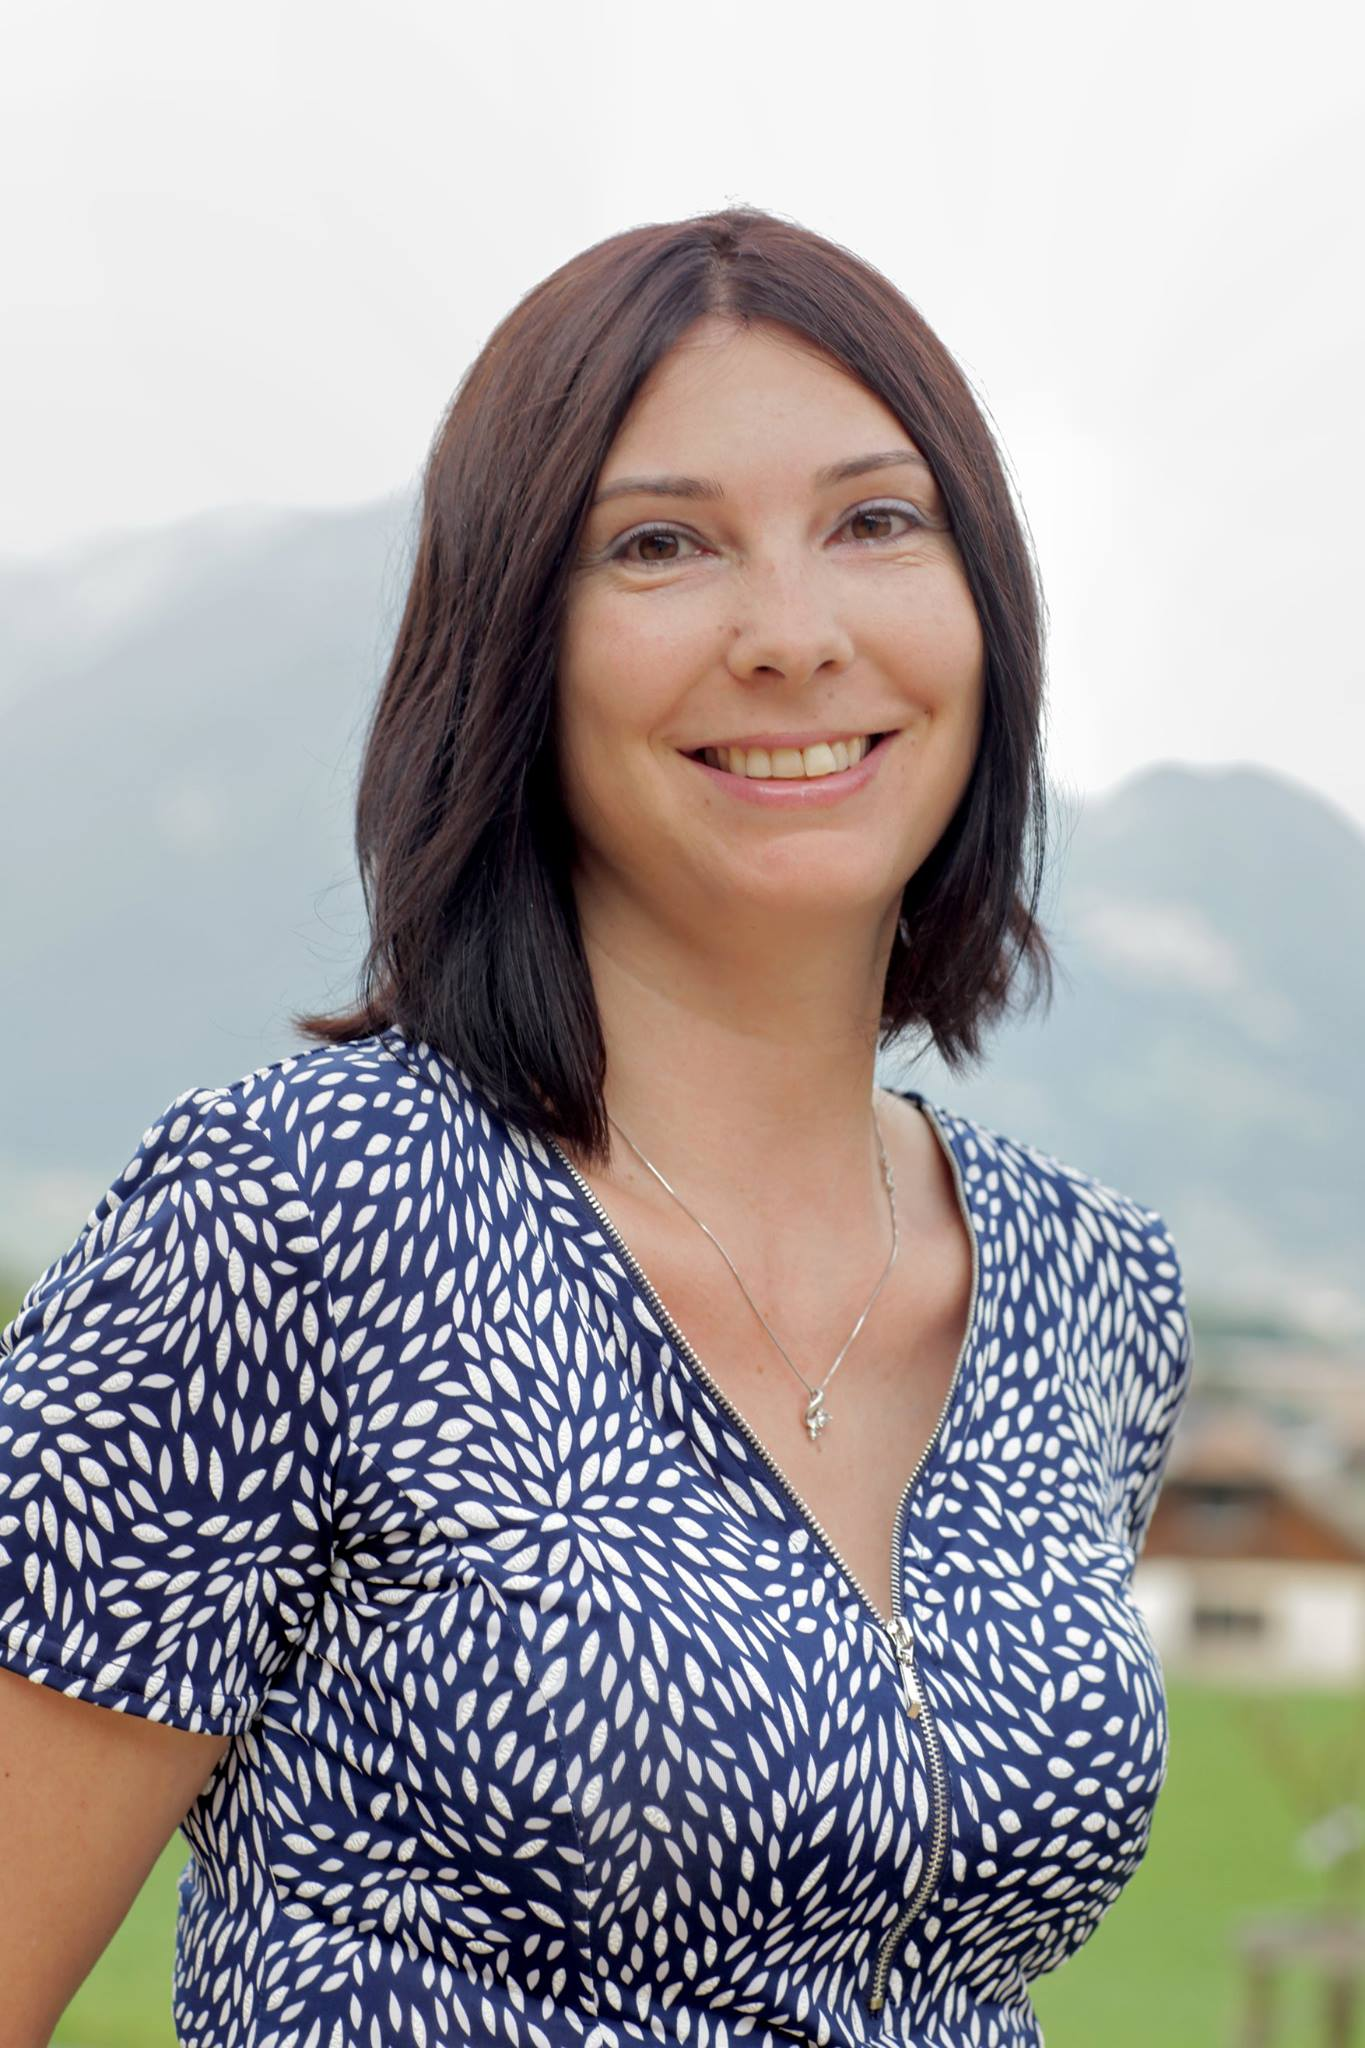 Gabrielle Olloz-Burdet